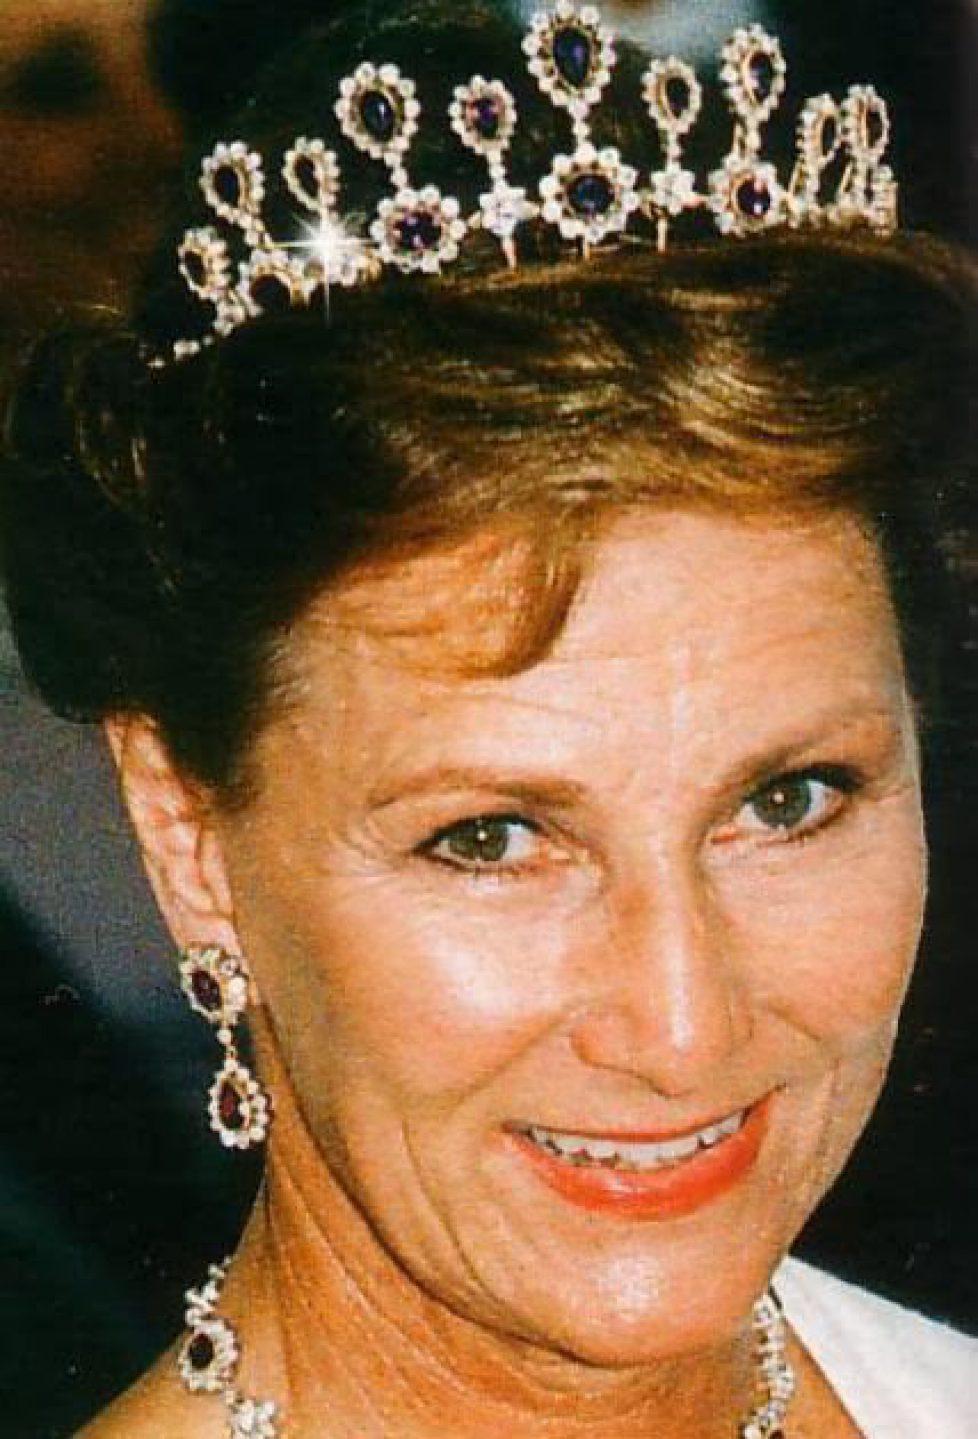 Amethyst Necklace Tiara (1990s) for Queen Sonja 1